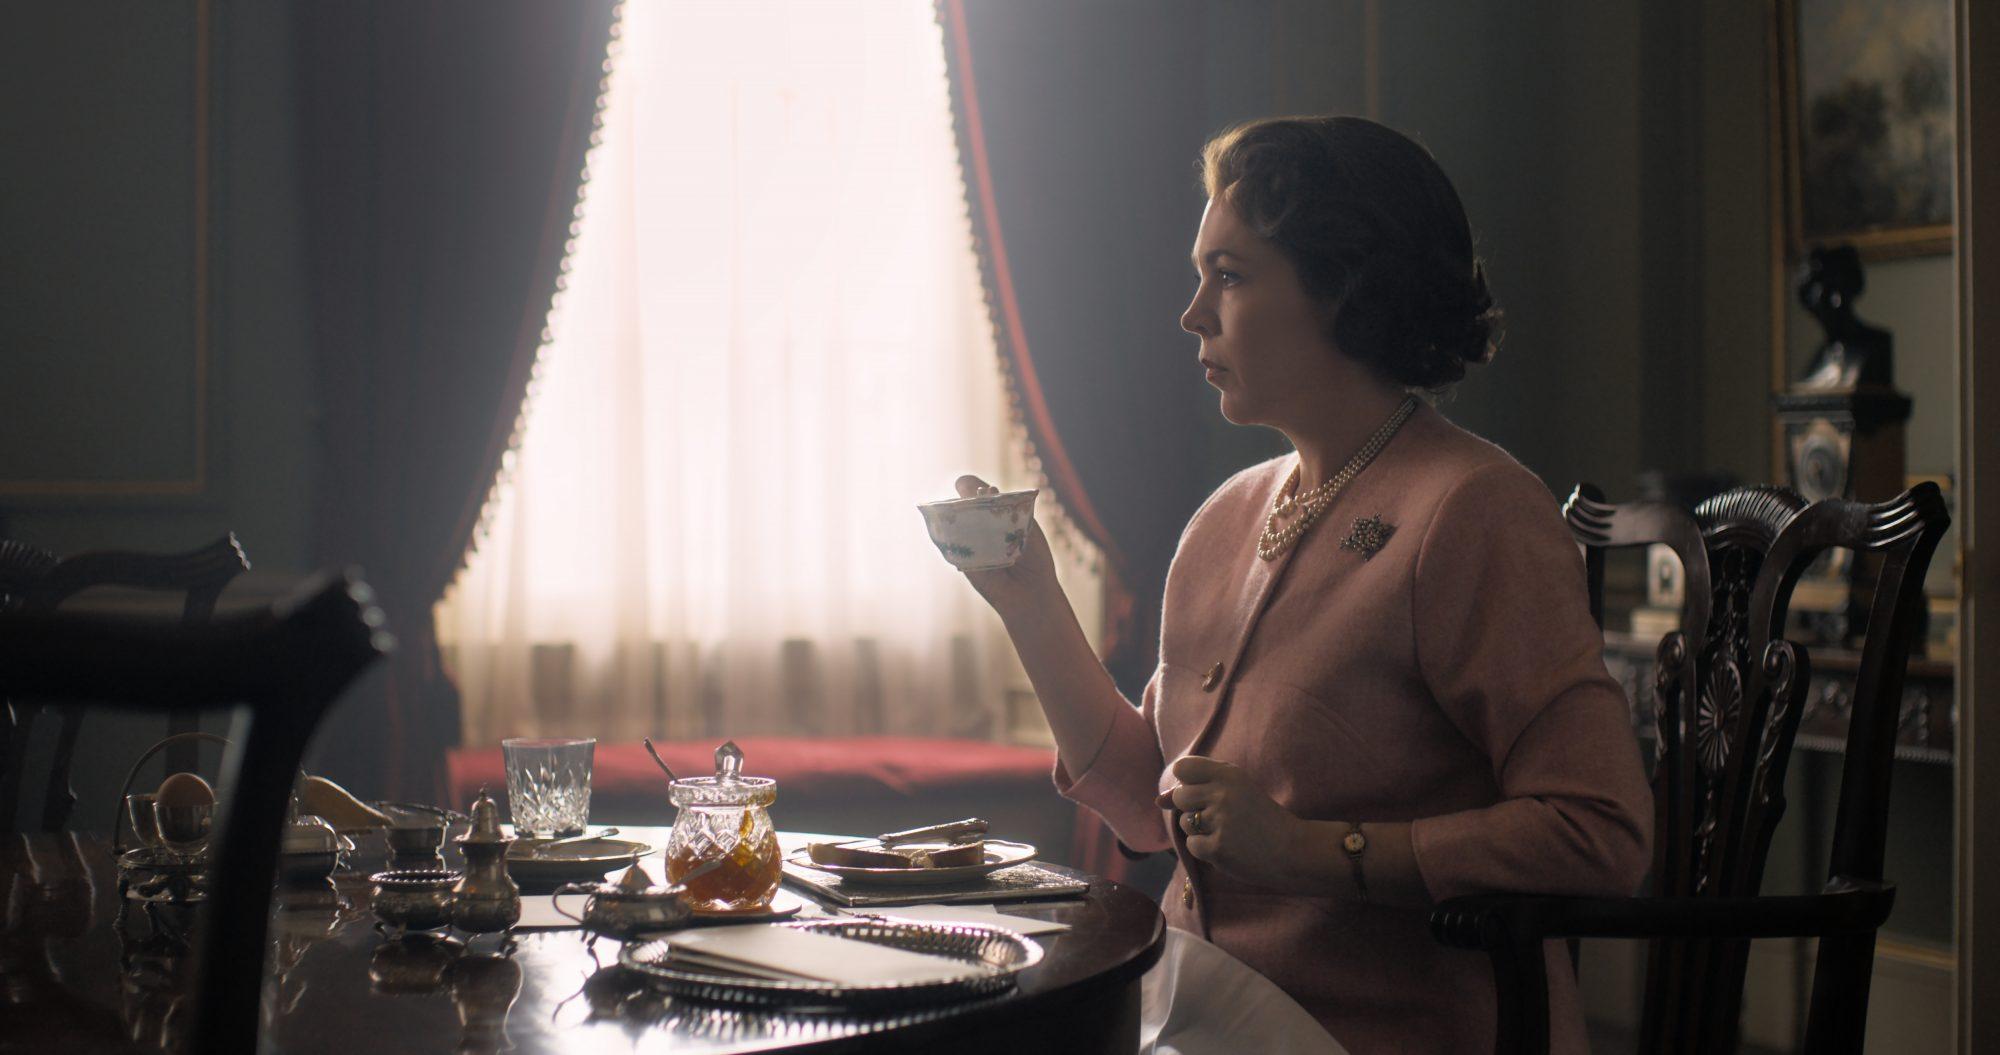 Olivia Colman as Queen Elizabeth II in 'The Crown'